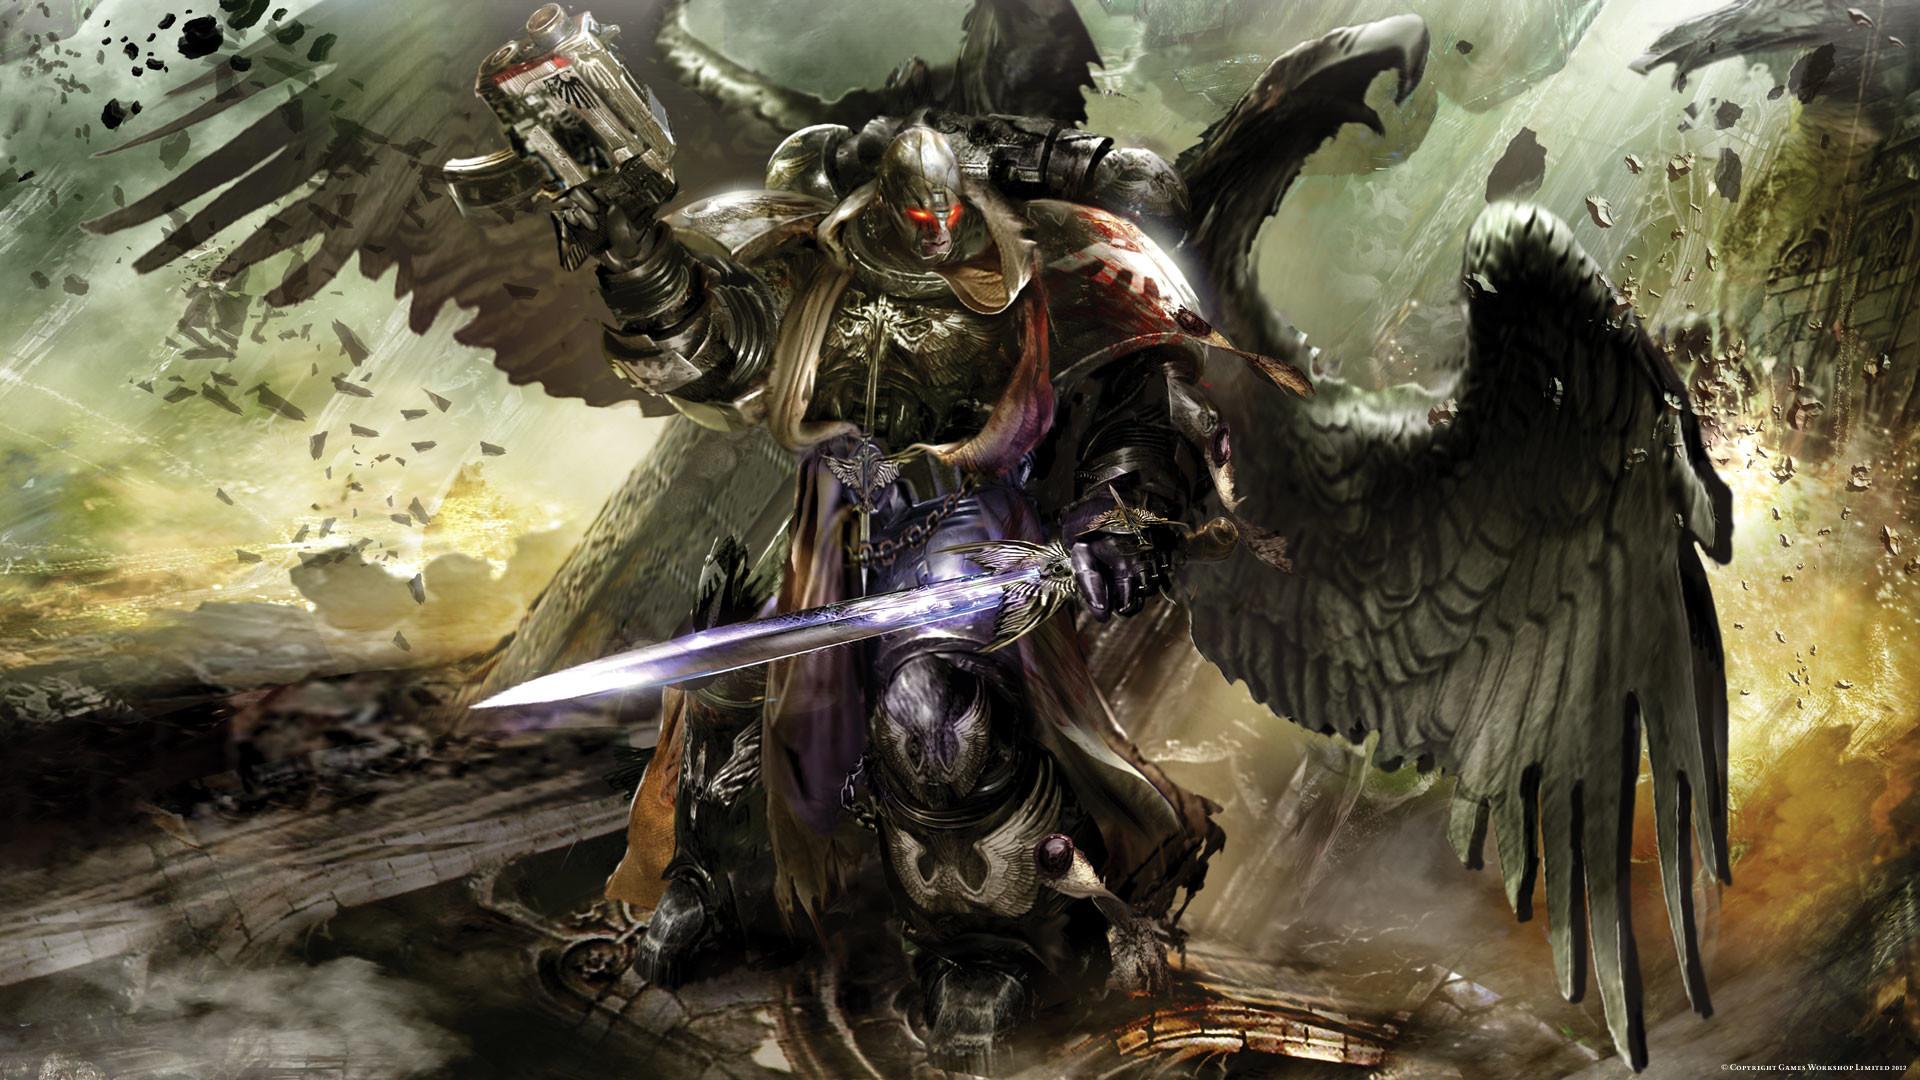 Dark Angels 40K wallpaper – 1158256